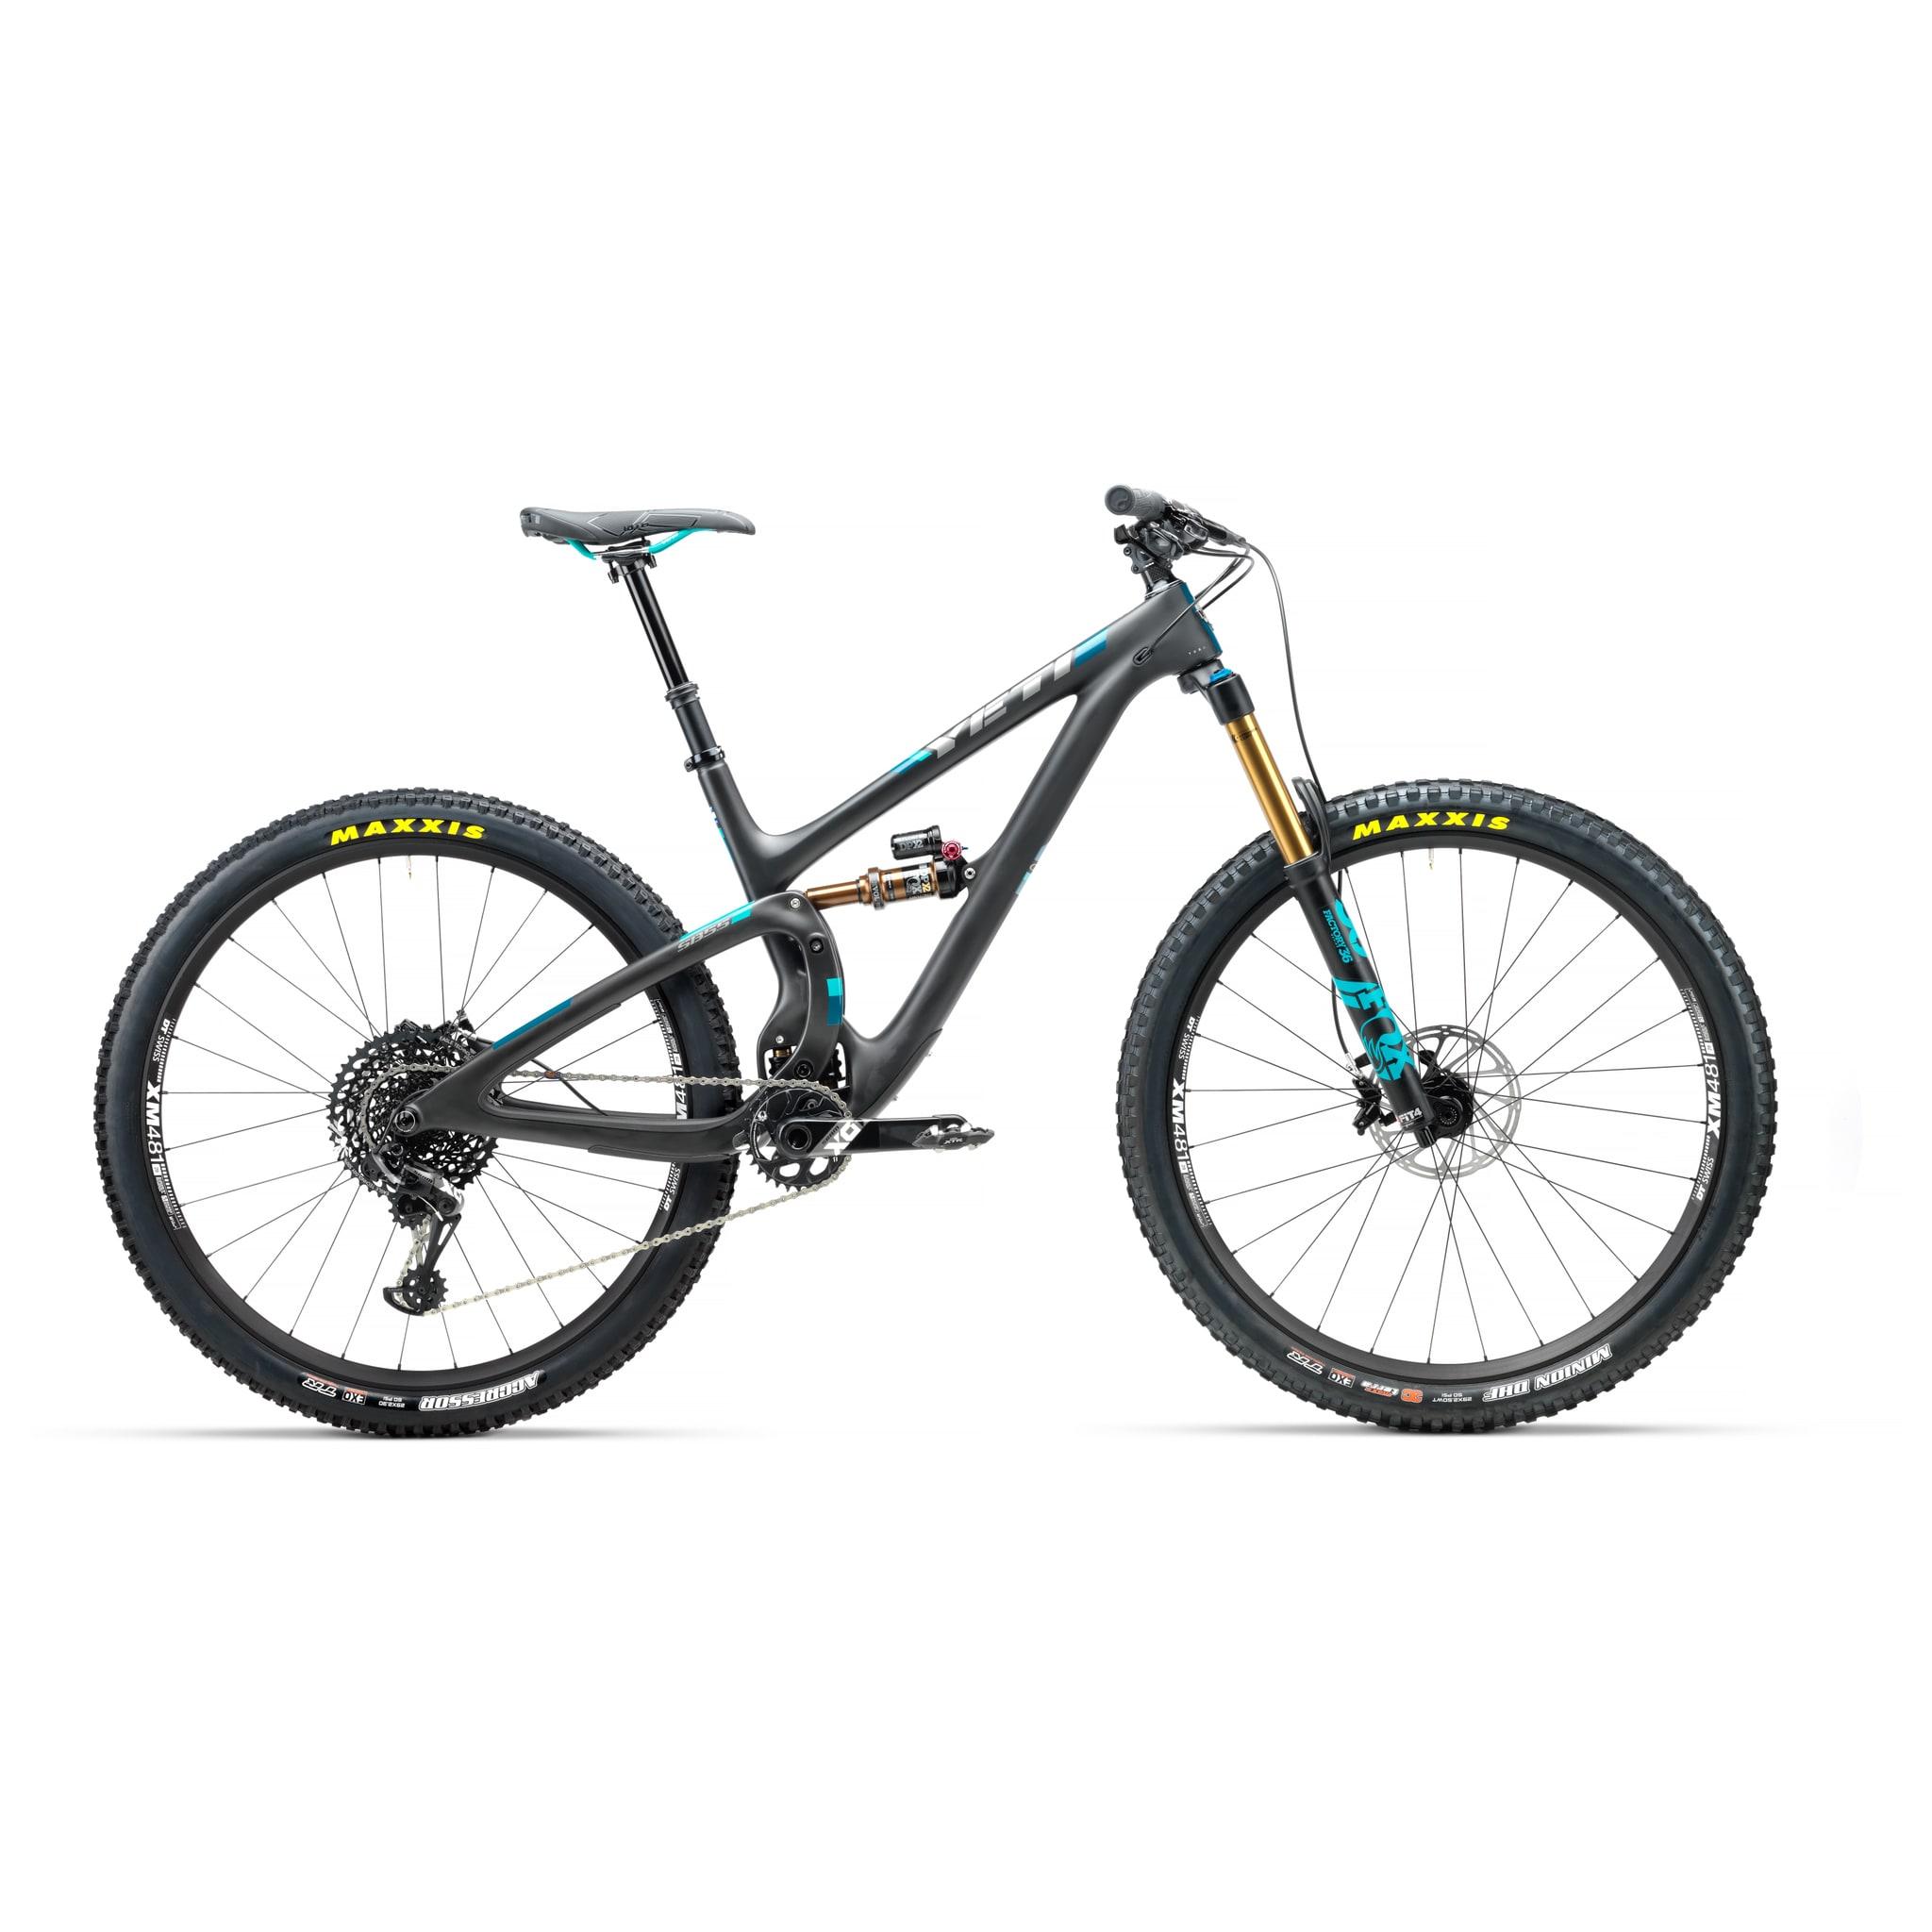 2018 SB55 Turq X01 Eagle